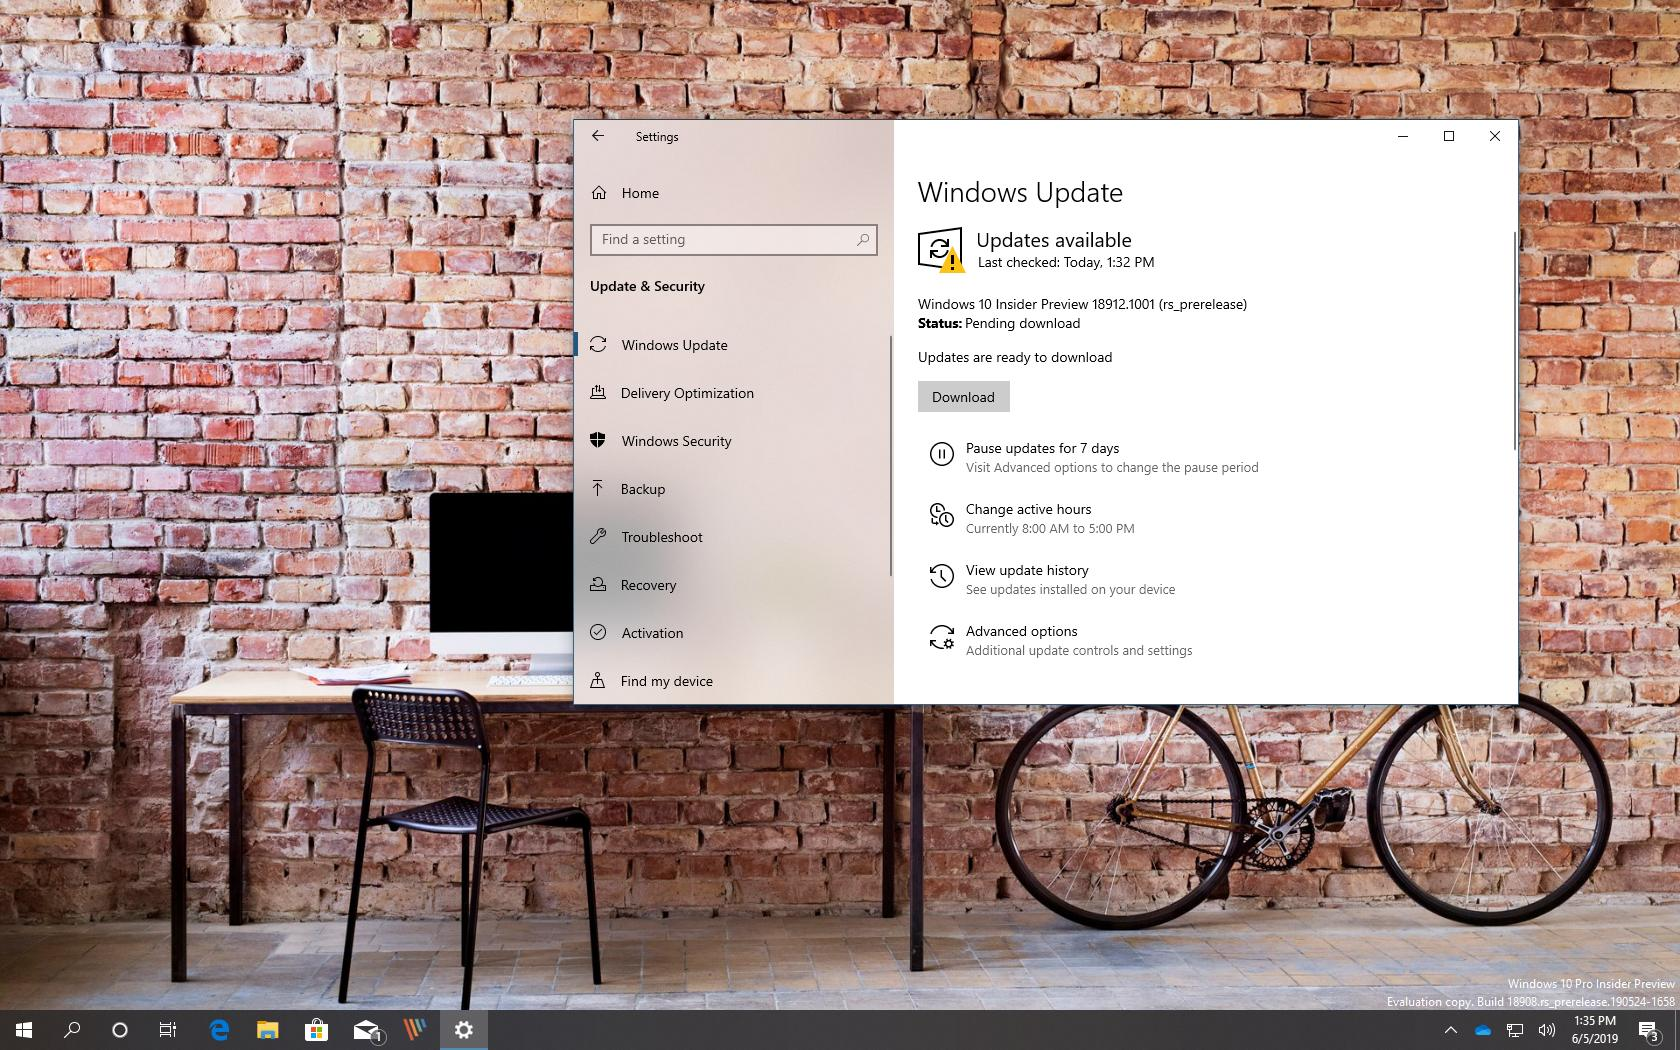 Windows 10 build 18912